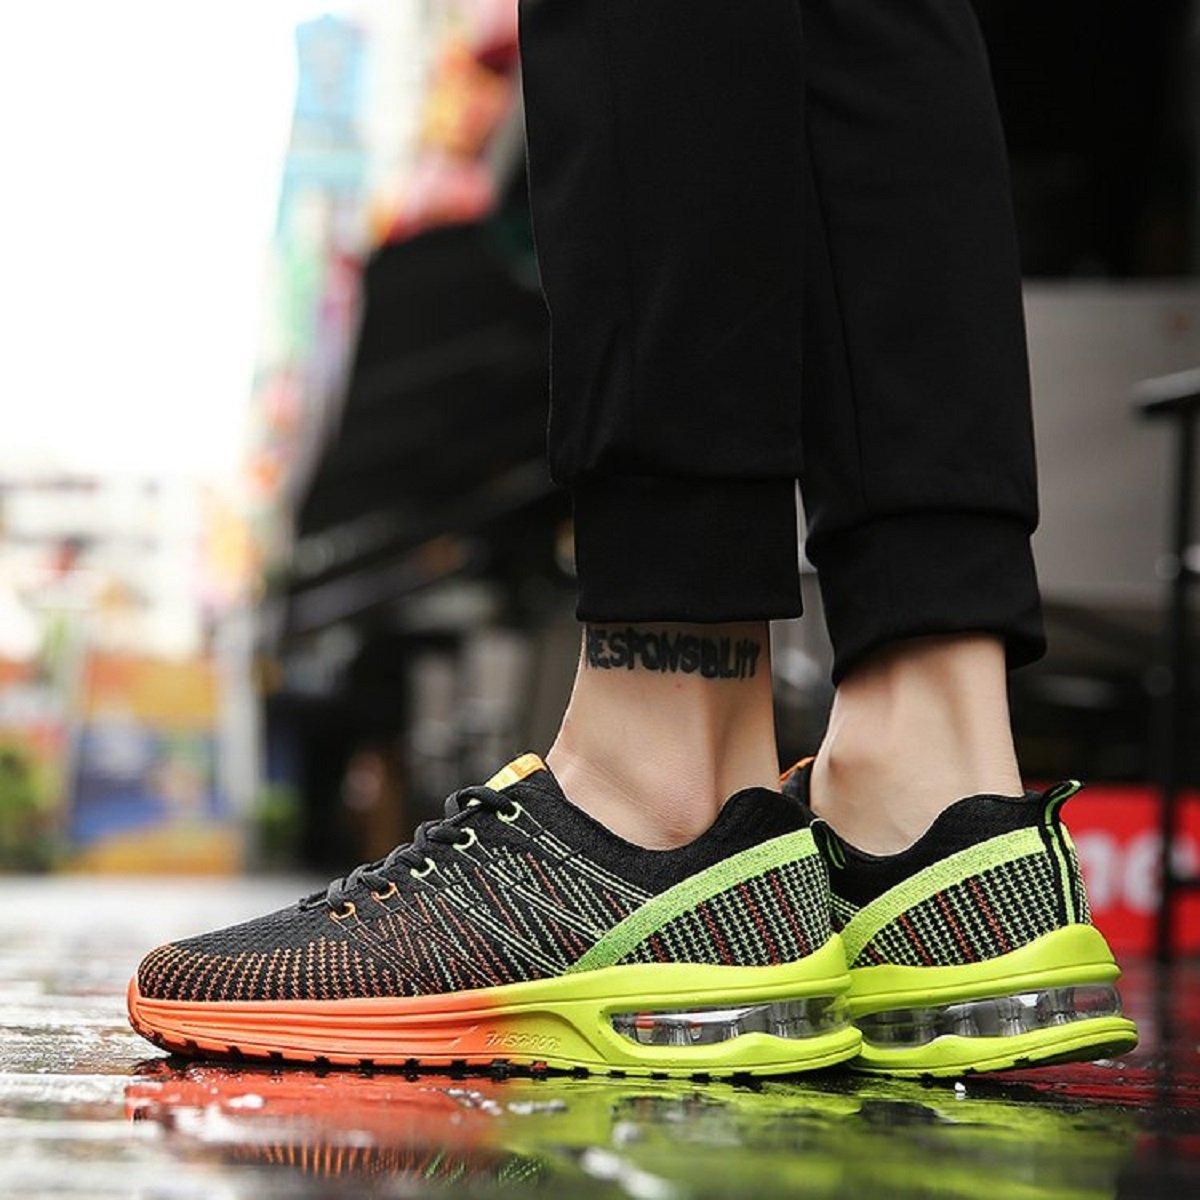 NEOKER Donna Scarpe da Running Sportive Corsa Sneakers Ginnastica Outdoor  Multisport Shoes 56c29b869af